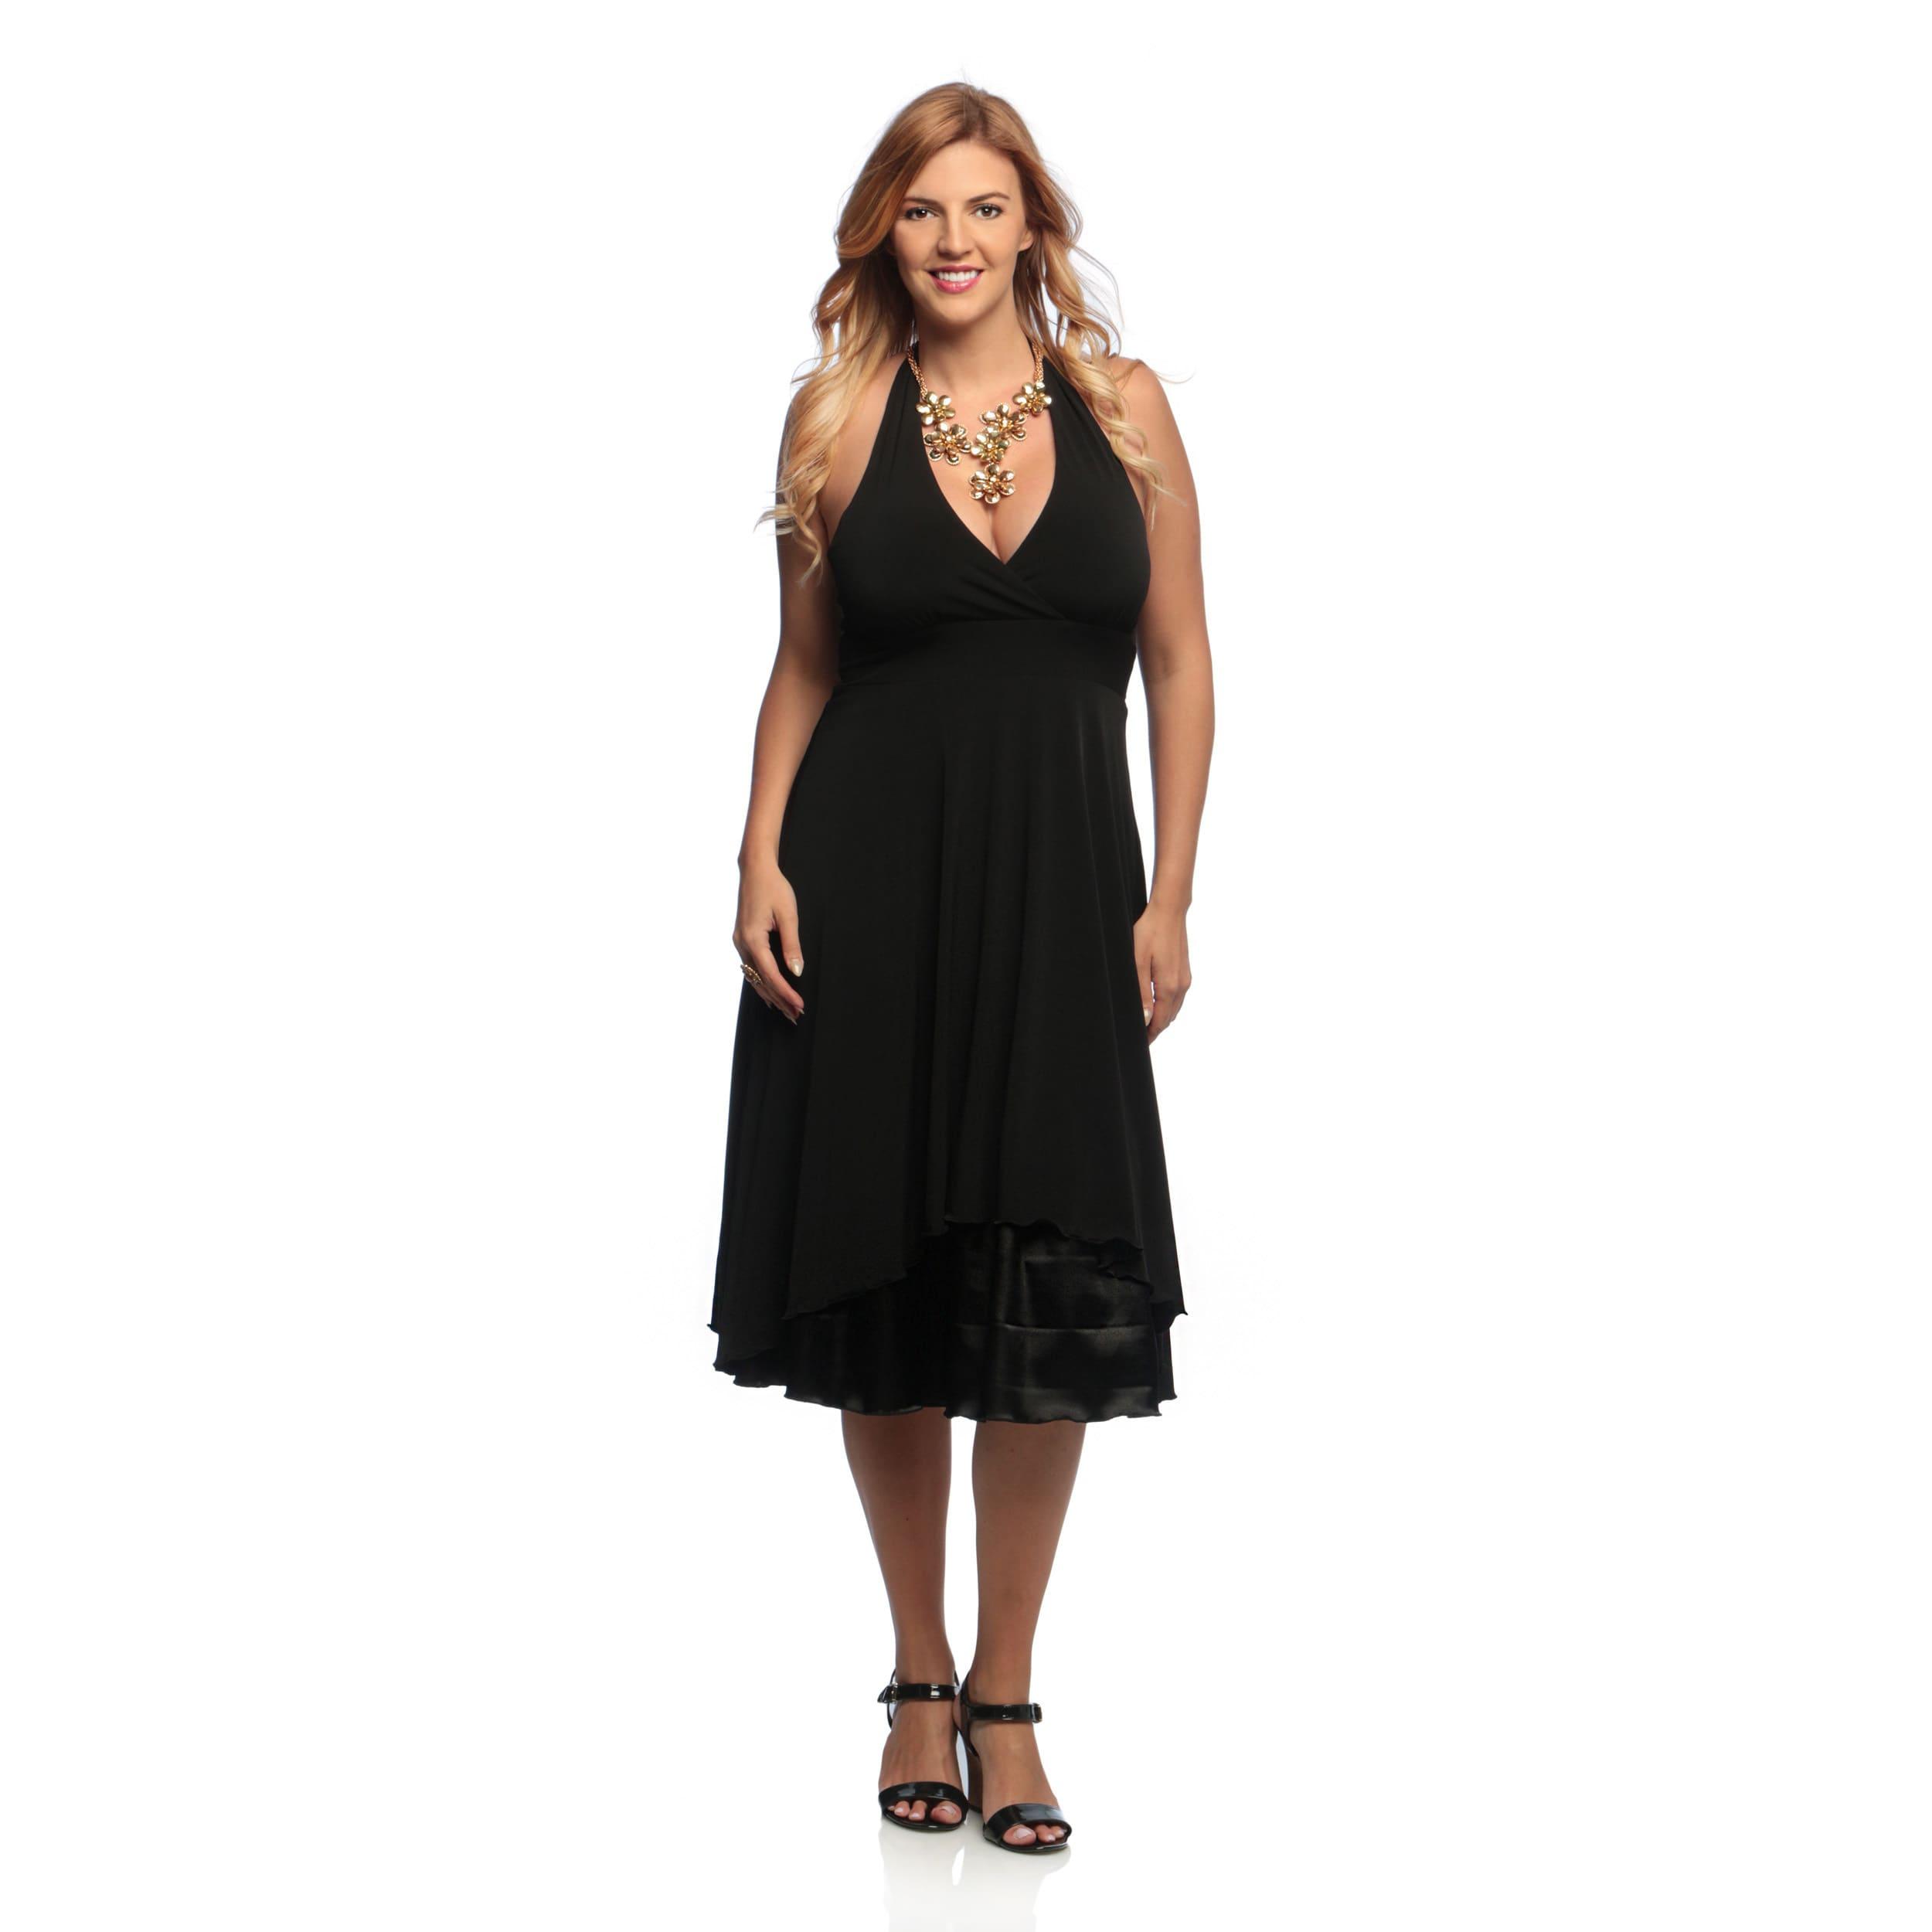 Evanese Women\'s Plus Size Black Halter Neck Dress